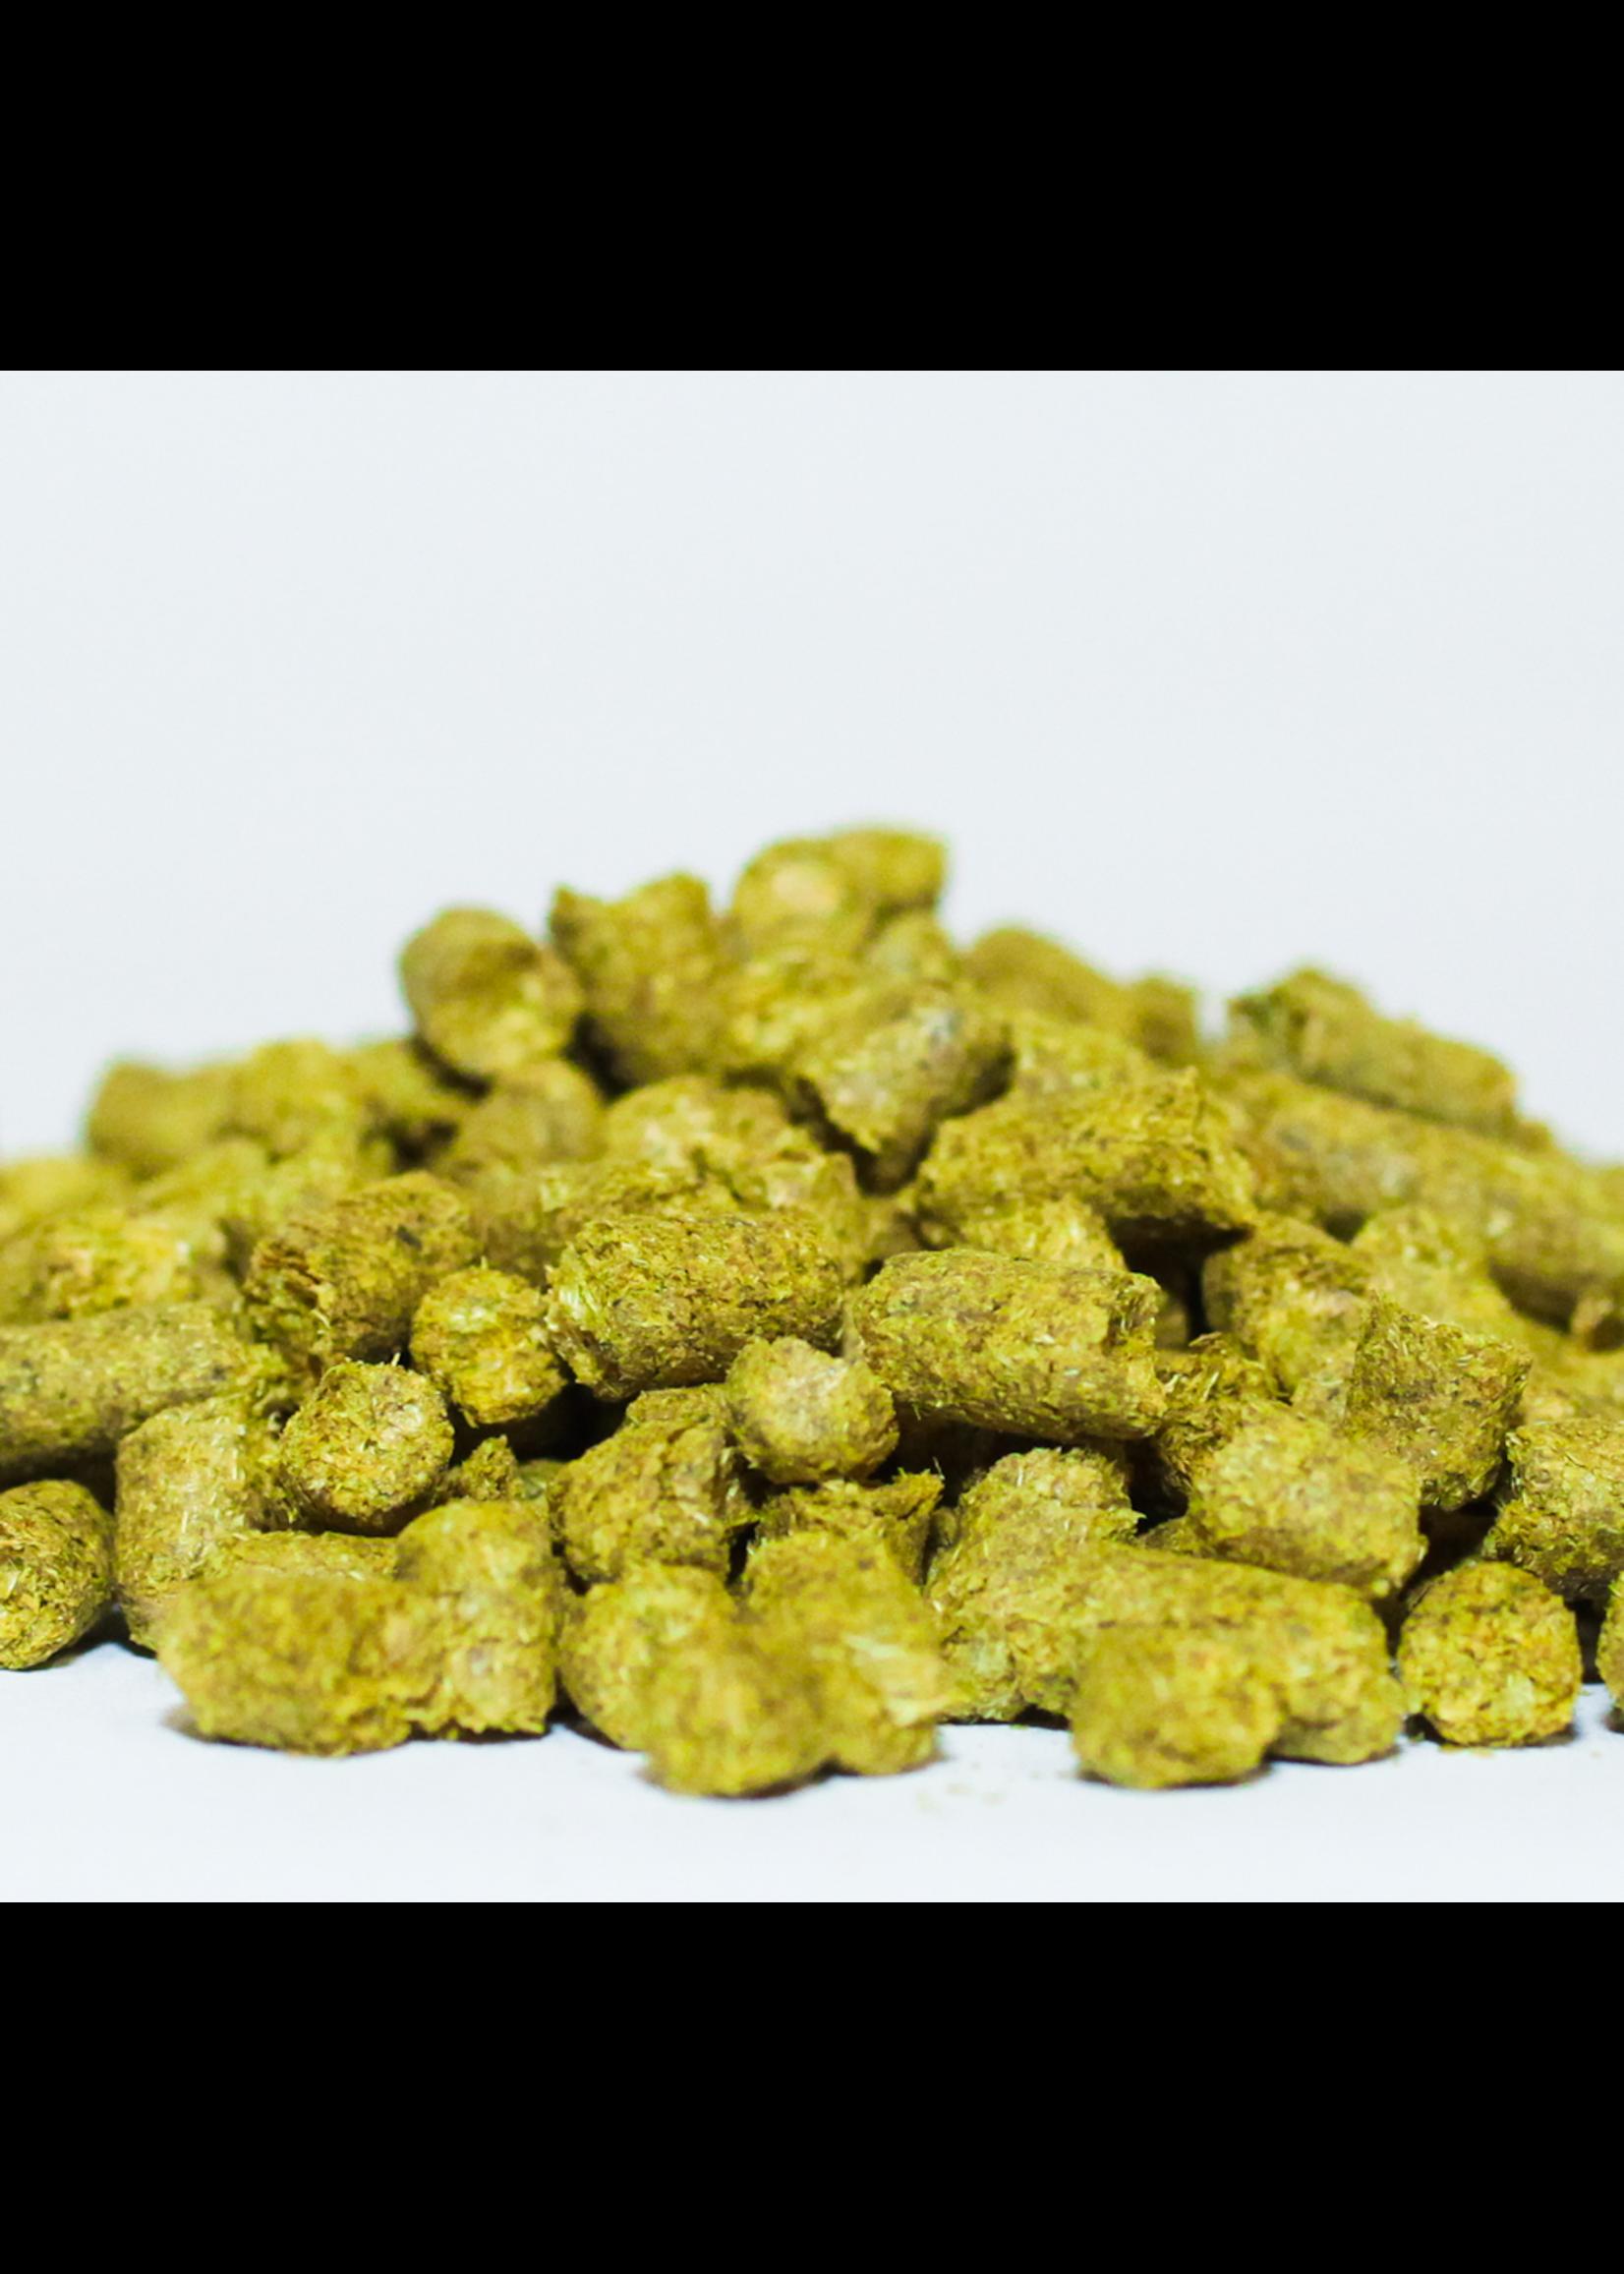 Hops Styrian Celeia Golding Hops (Slovenian) - Pellets - 1 oz